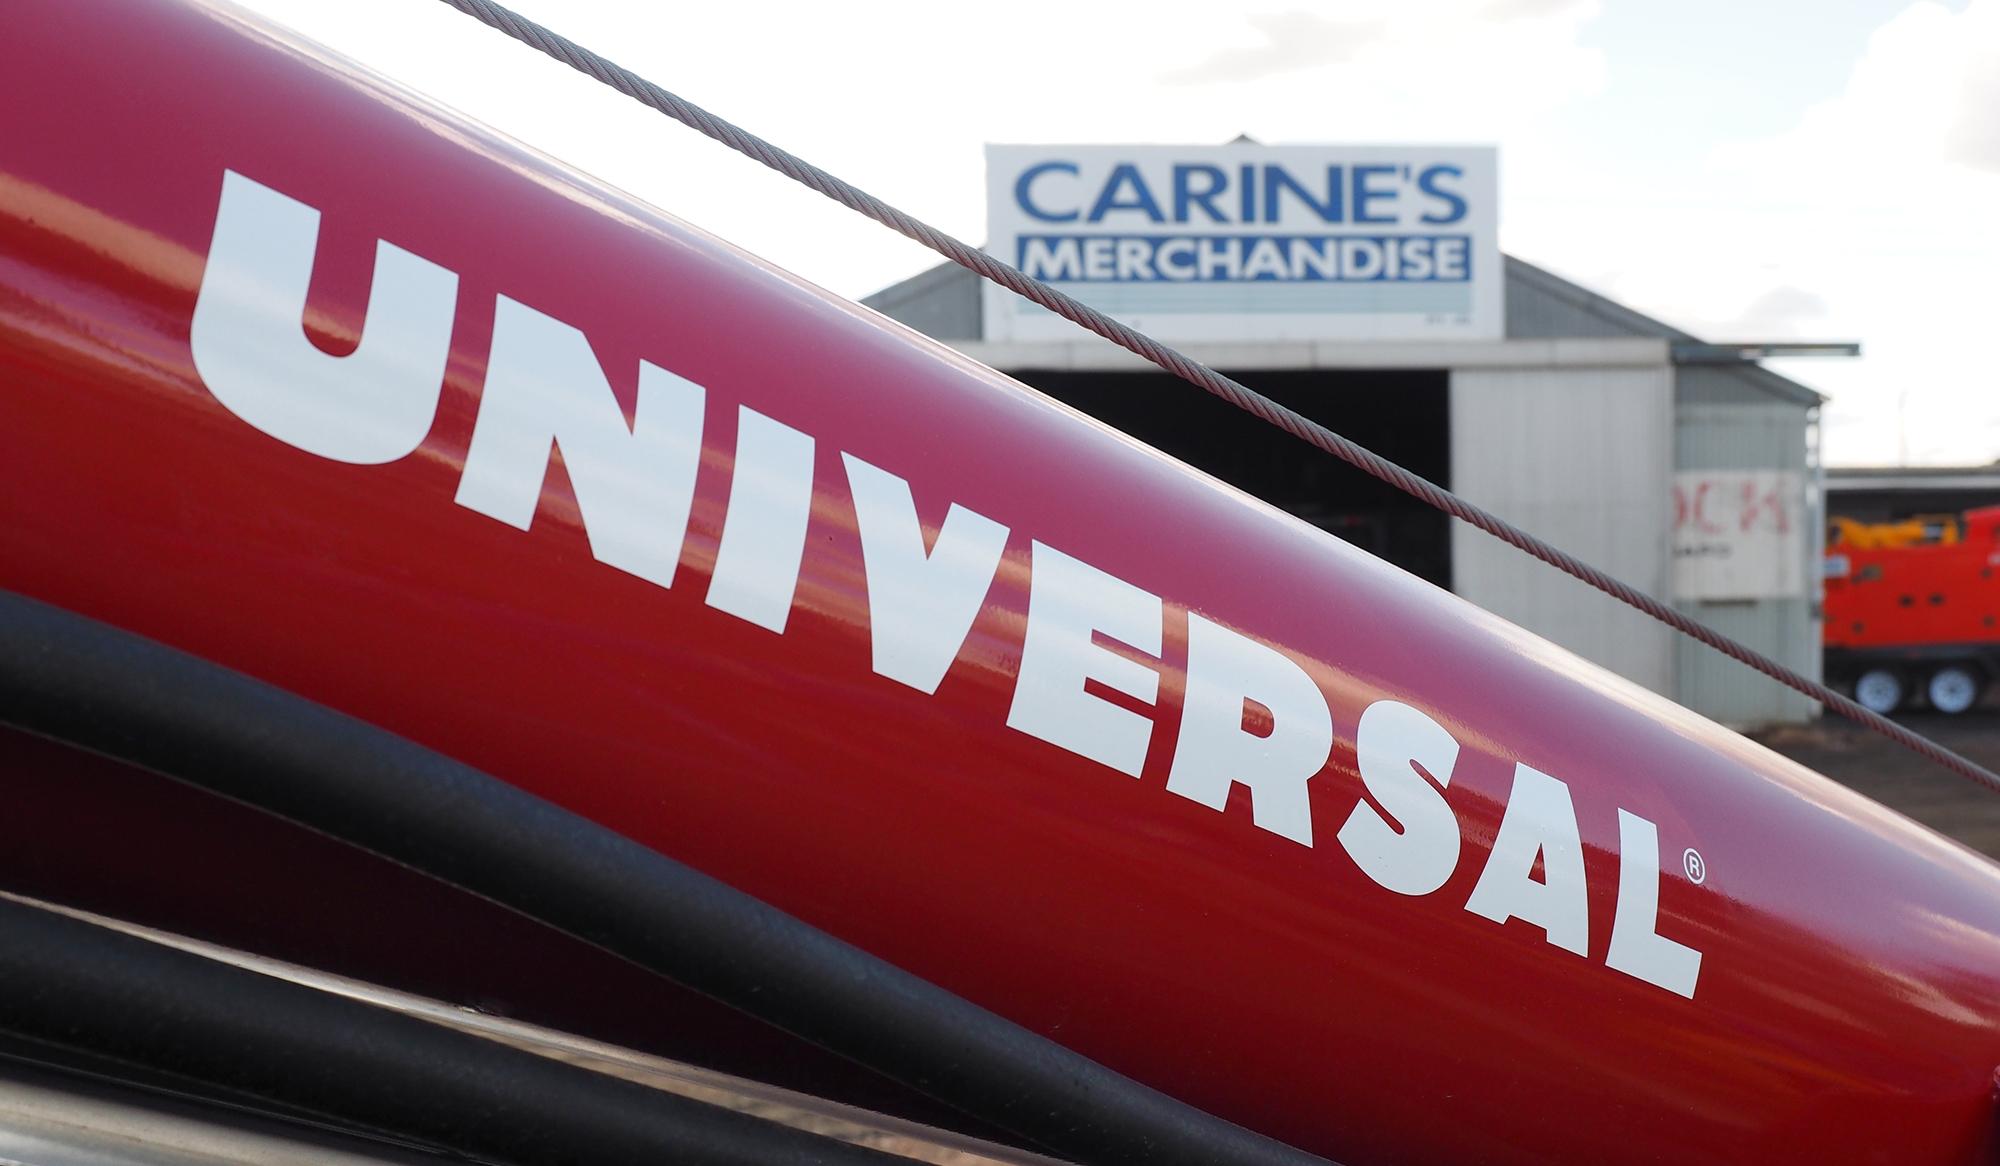 Carines-Merchandise-UniTube5